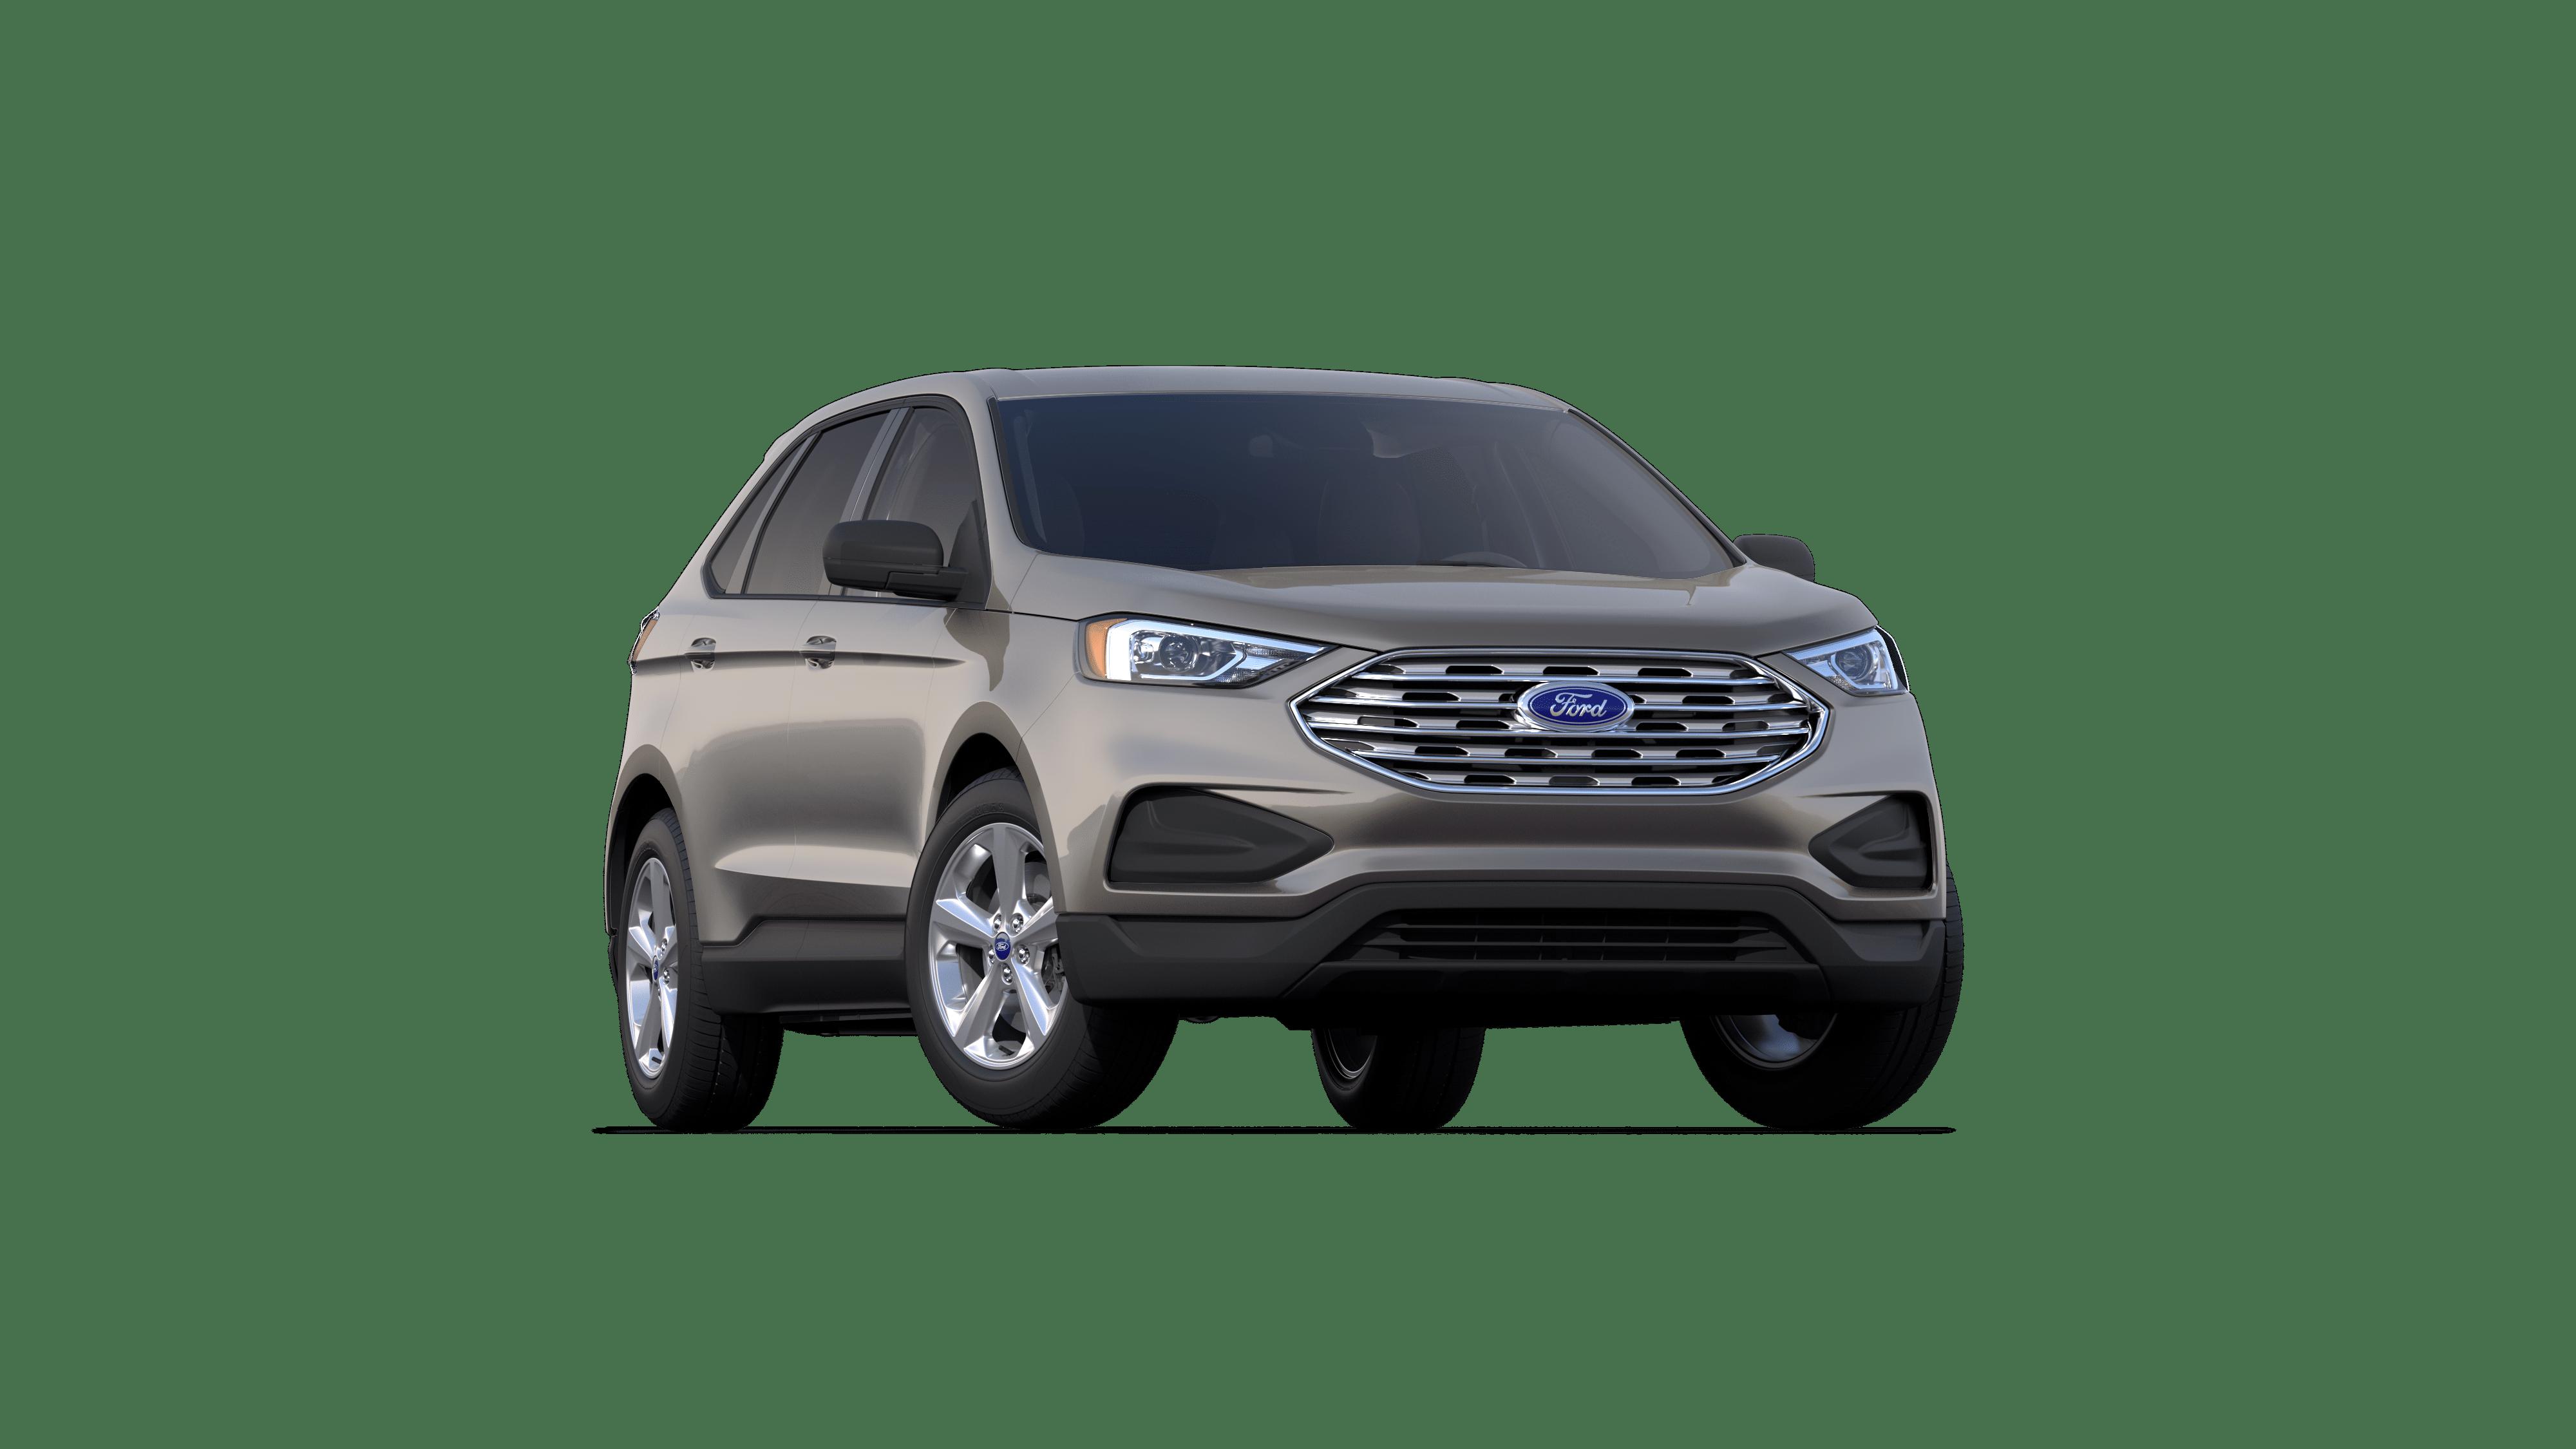 2019 Ford Edge for sale in Bremerton - 2FMPK4G97KBC51440